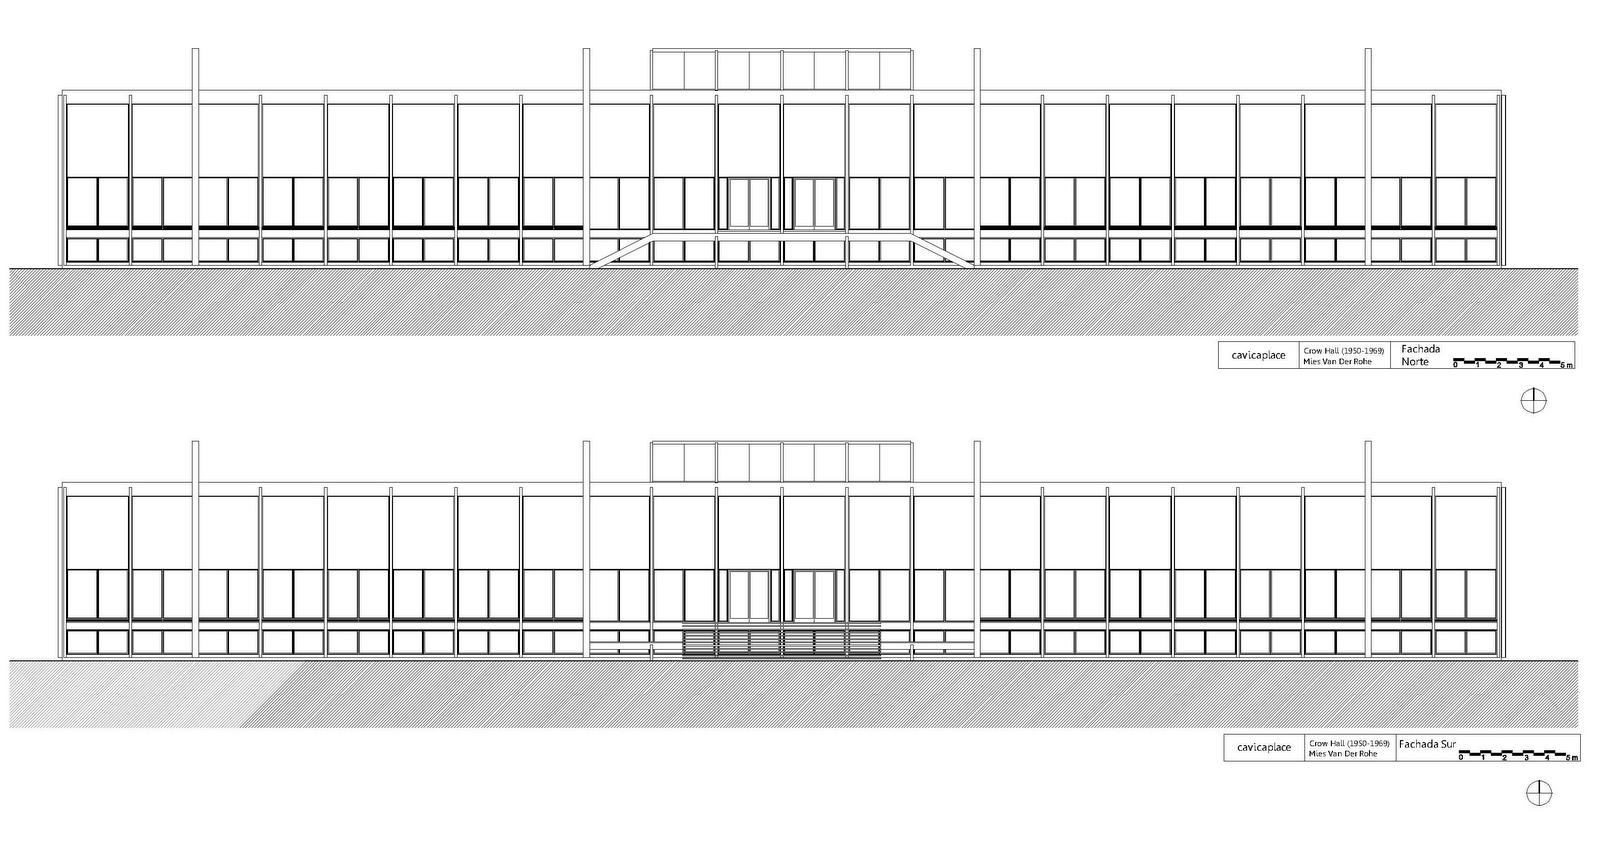 Manheim Floor Plan Mies Van Der Rohe The Crow Hall 1950 69 Taringa